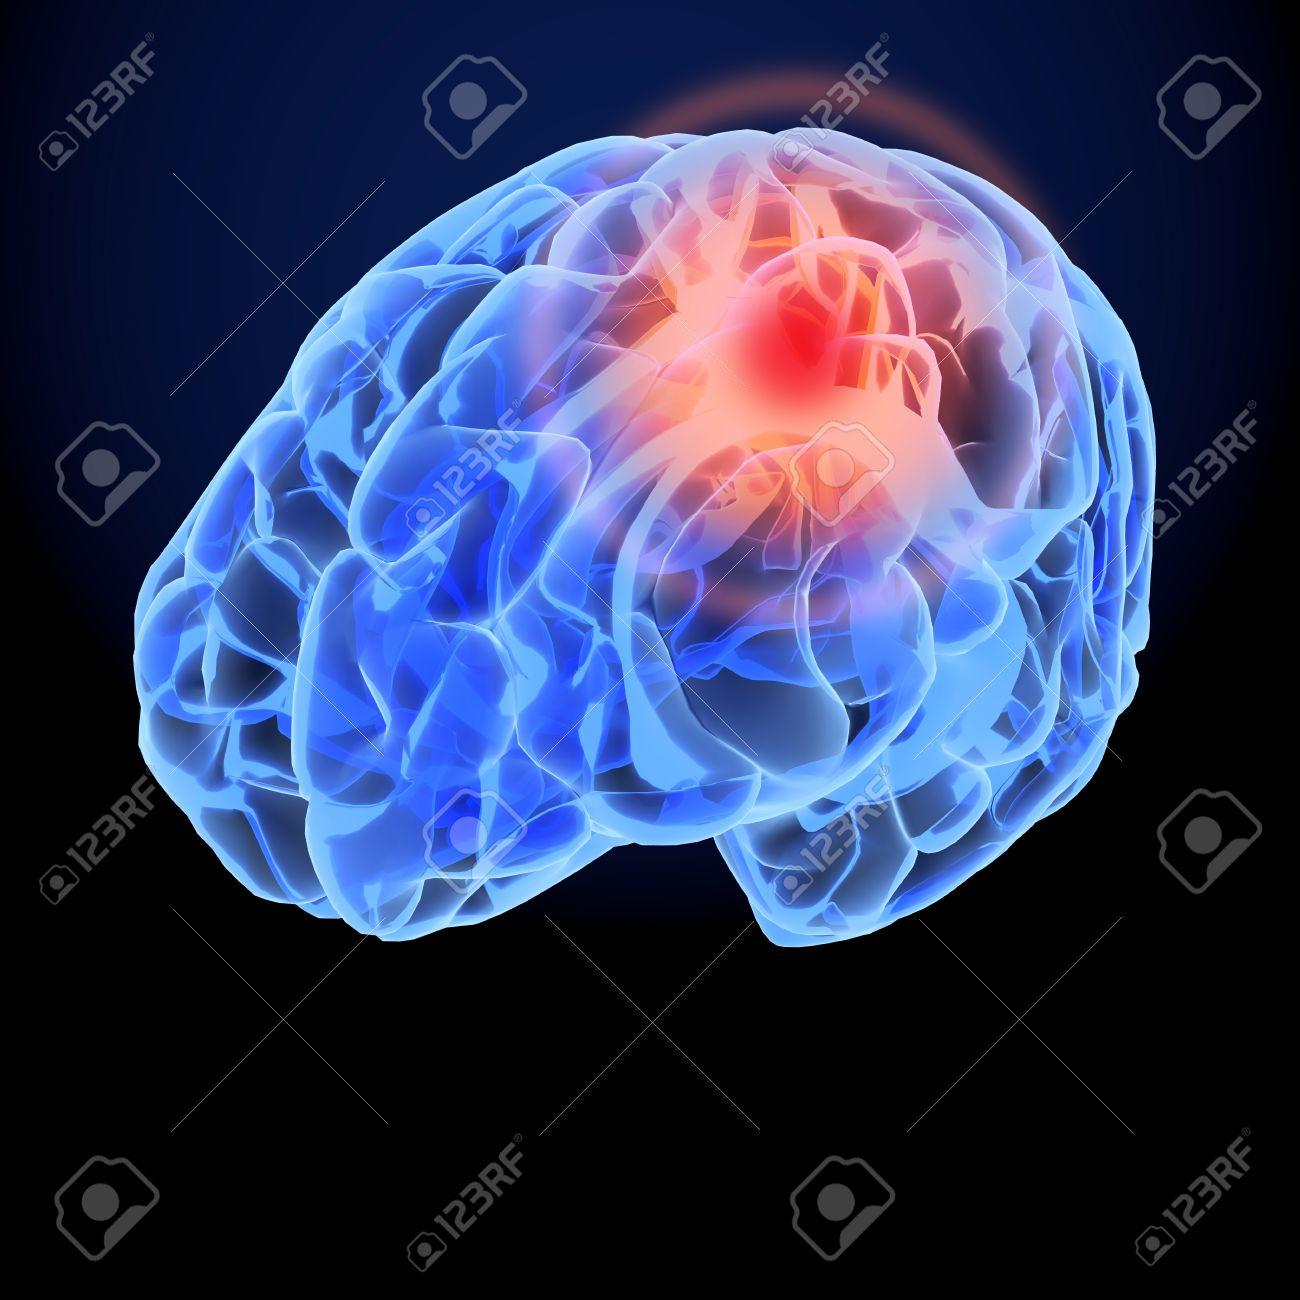 Kopfschmerzen X-Ray 3D-Modell. Gehirnneuronen Synapse, Anatomie ...